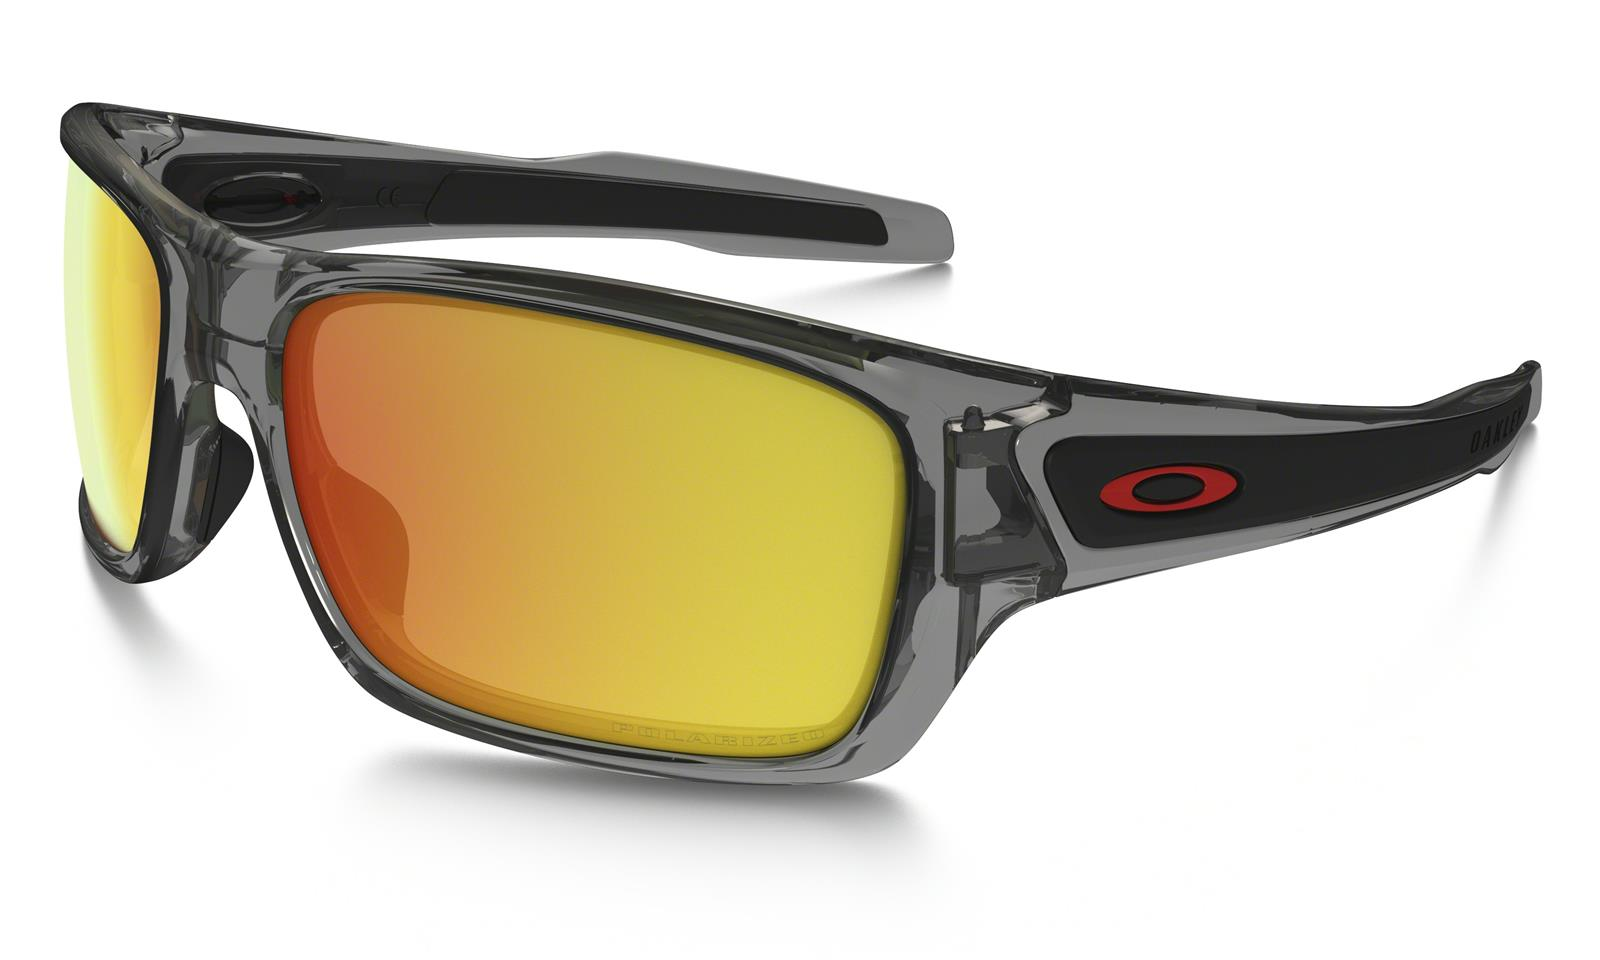 711ea35ec7 Oakley Turbine Sunglasses OO9263-10 - Free Shipping on Orders Over  99 at  Summit Racing